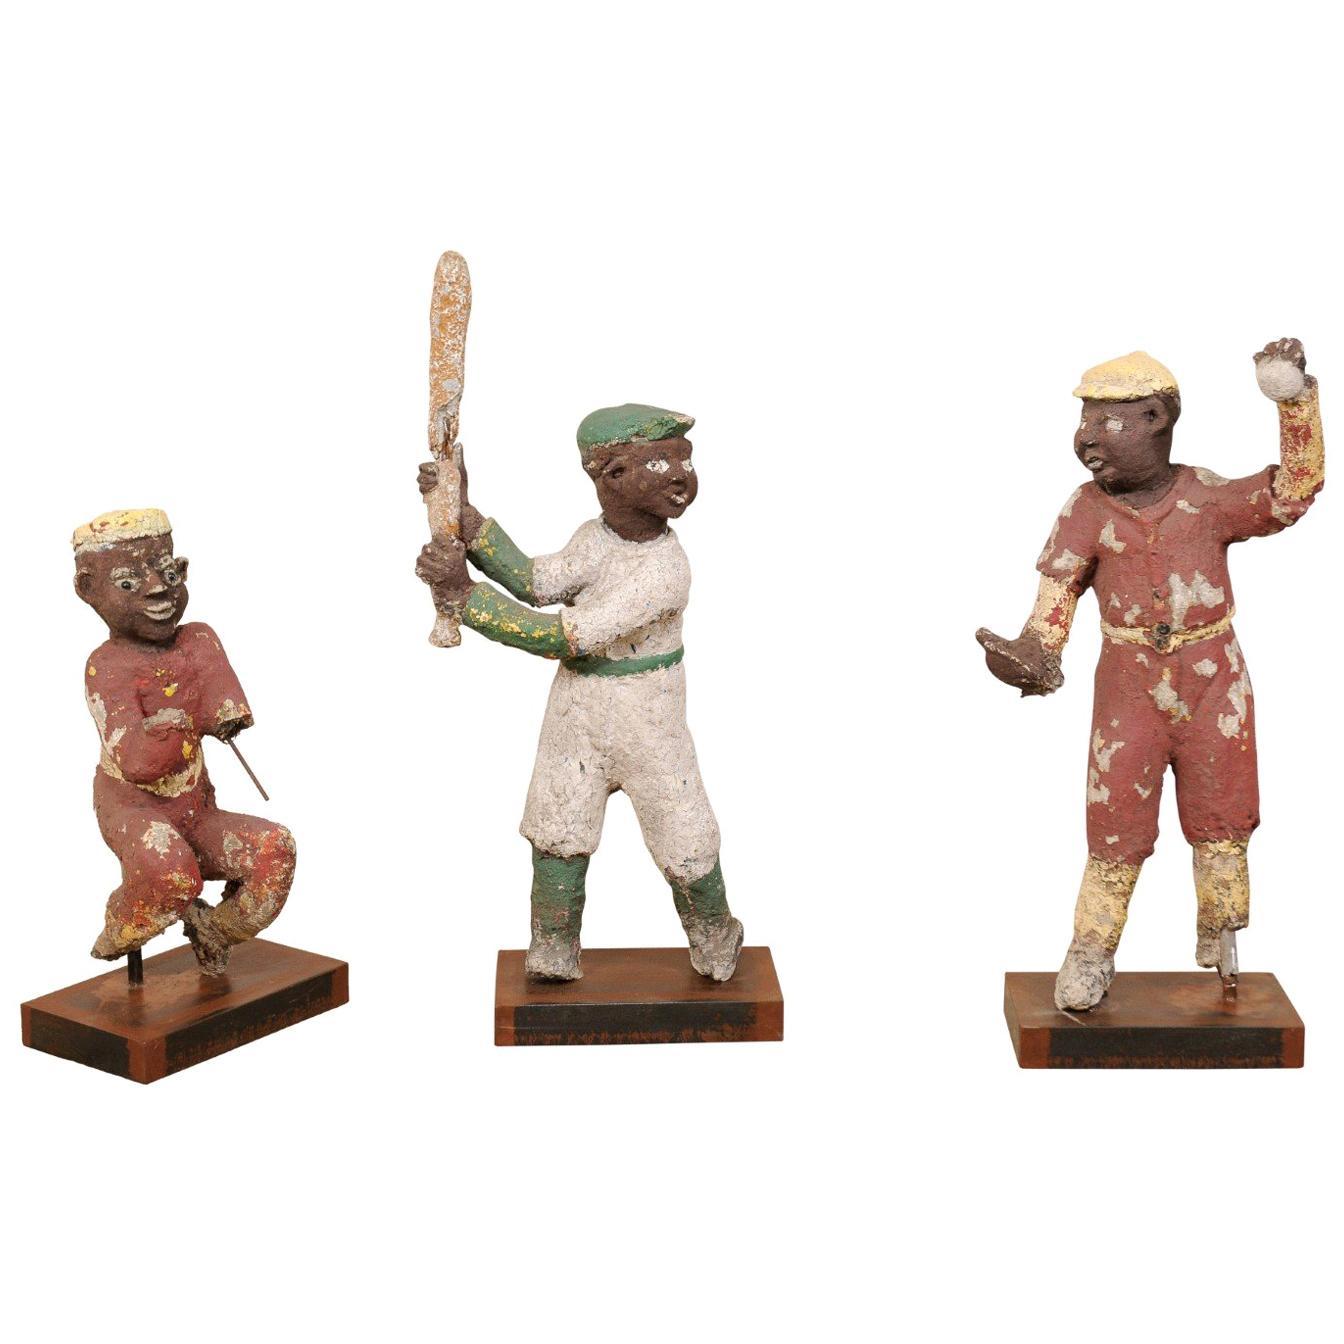 A Set of Black Americana Baseball Memorabilia Folk Art Figures, Circa 1930s-40s